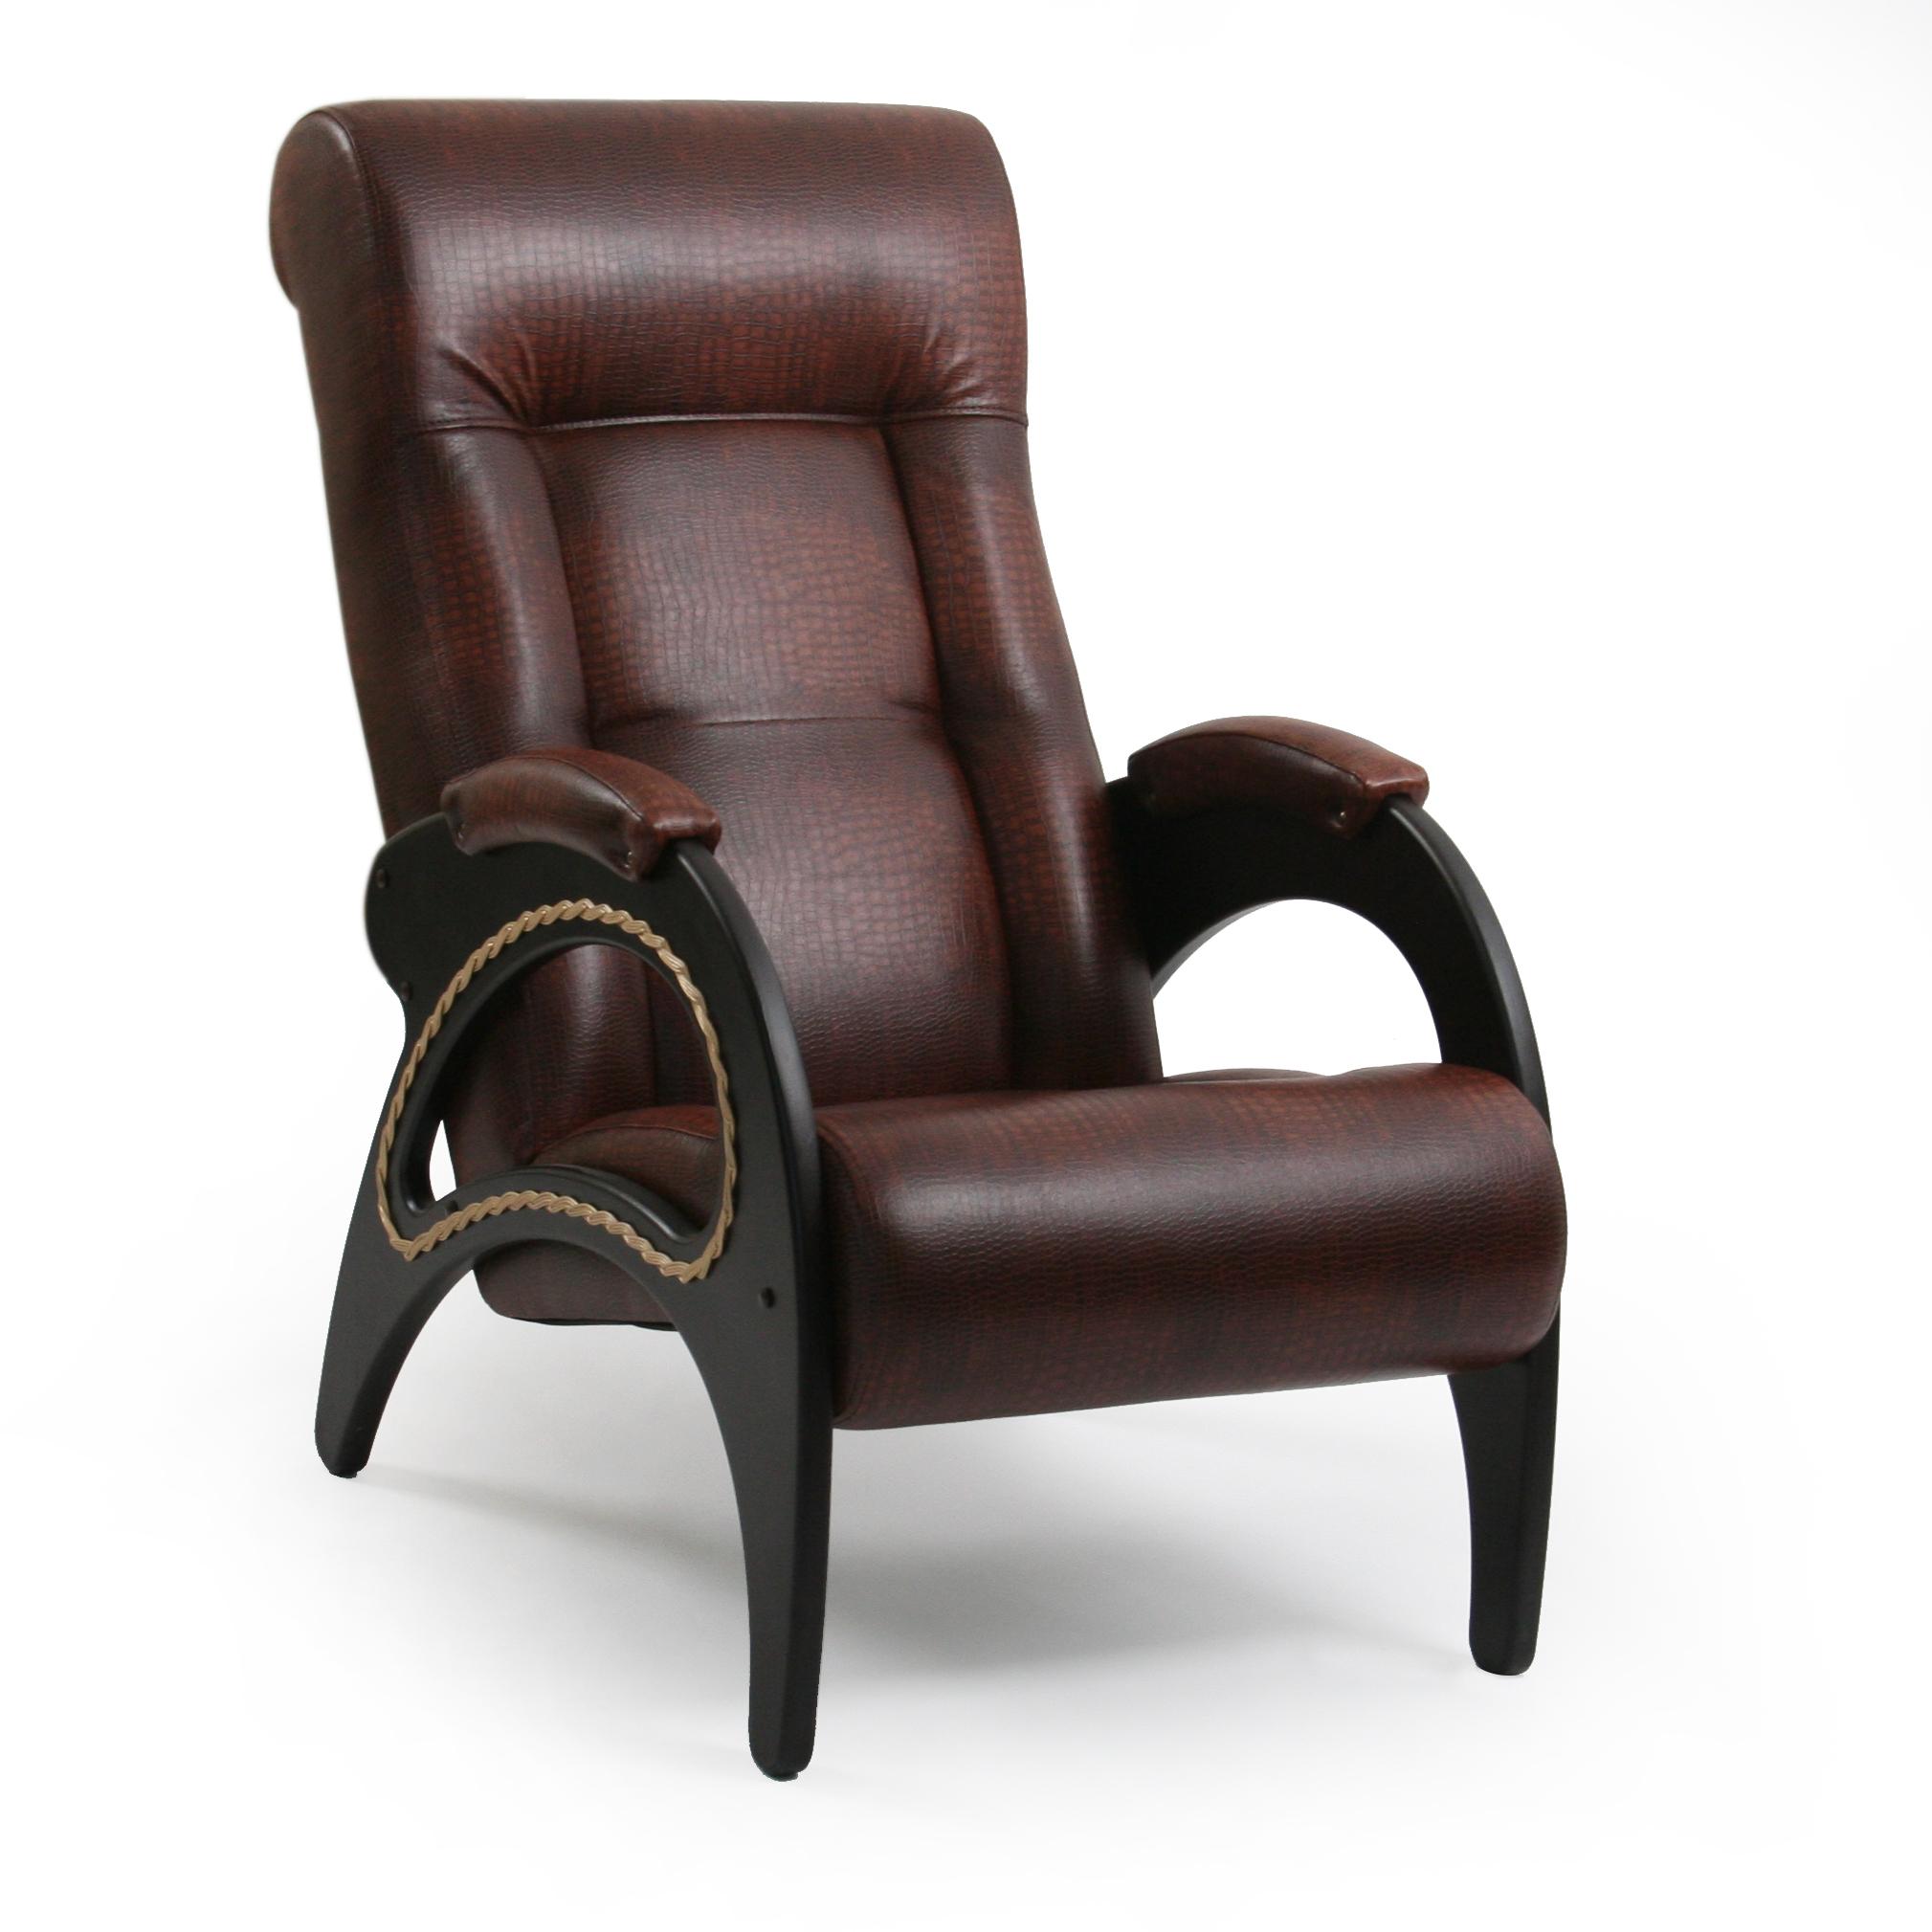 Кресло Комфорт model-41 (7954)